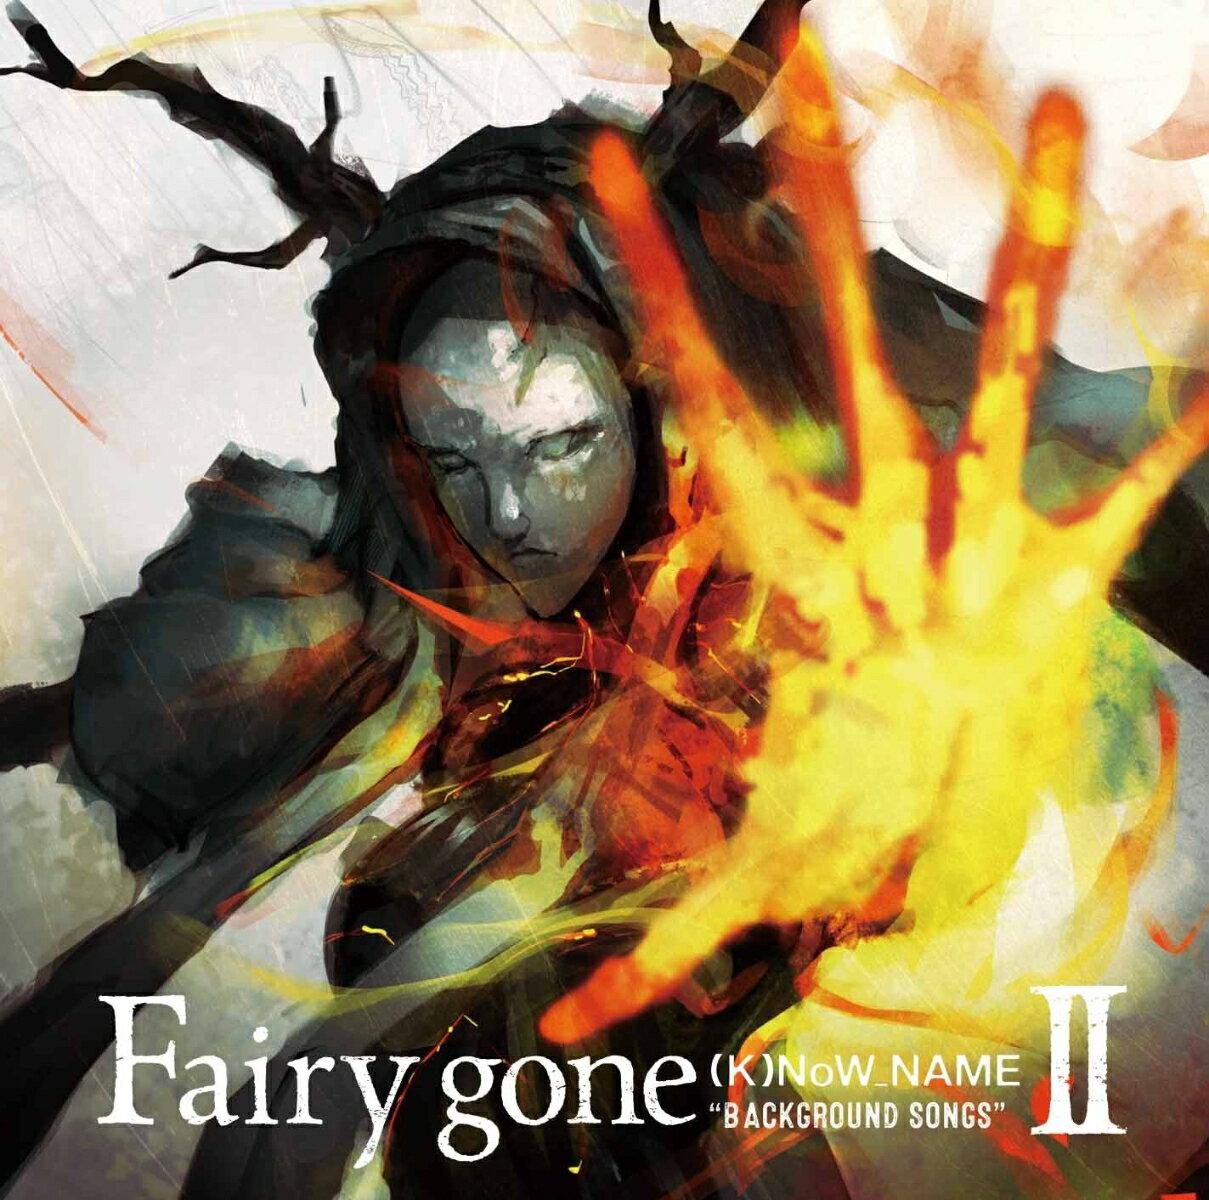 "TV アニメ『Fairy gone フェアリーゴーン』挿入歌アルバム 「Fairy gone""BACKGROUND SONGS""2」画像"